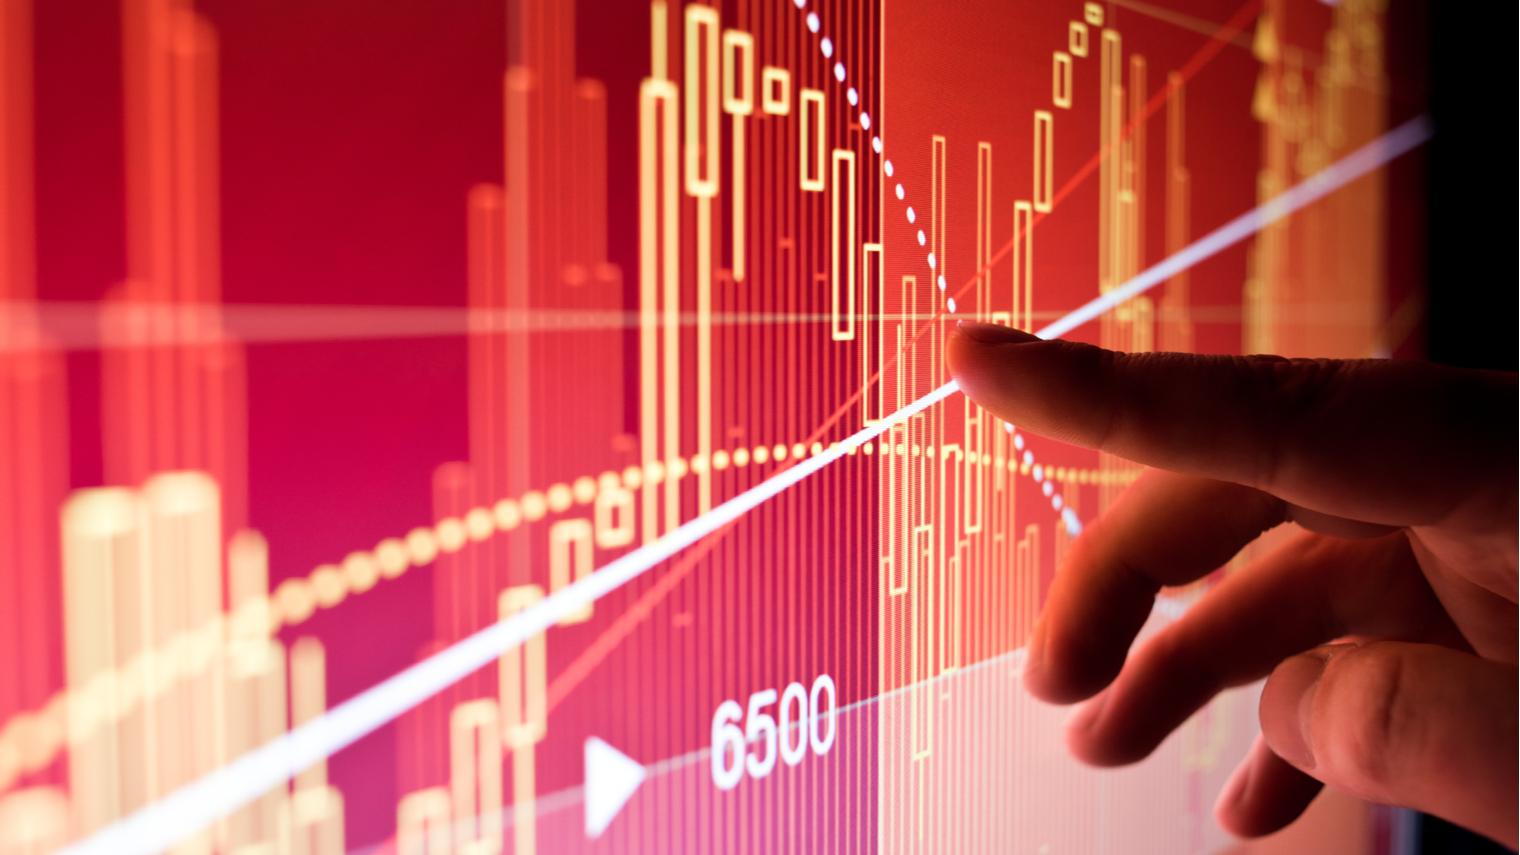 Graph of financial data